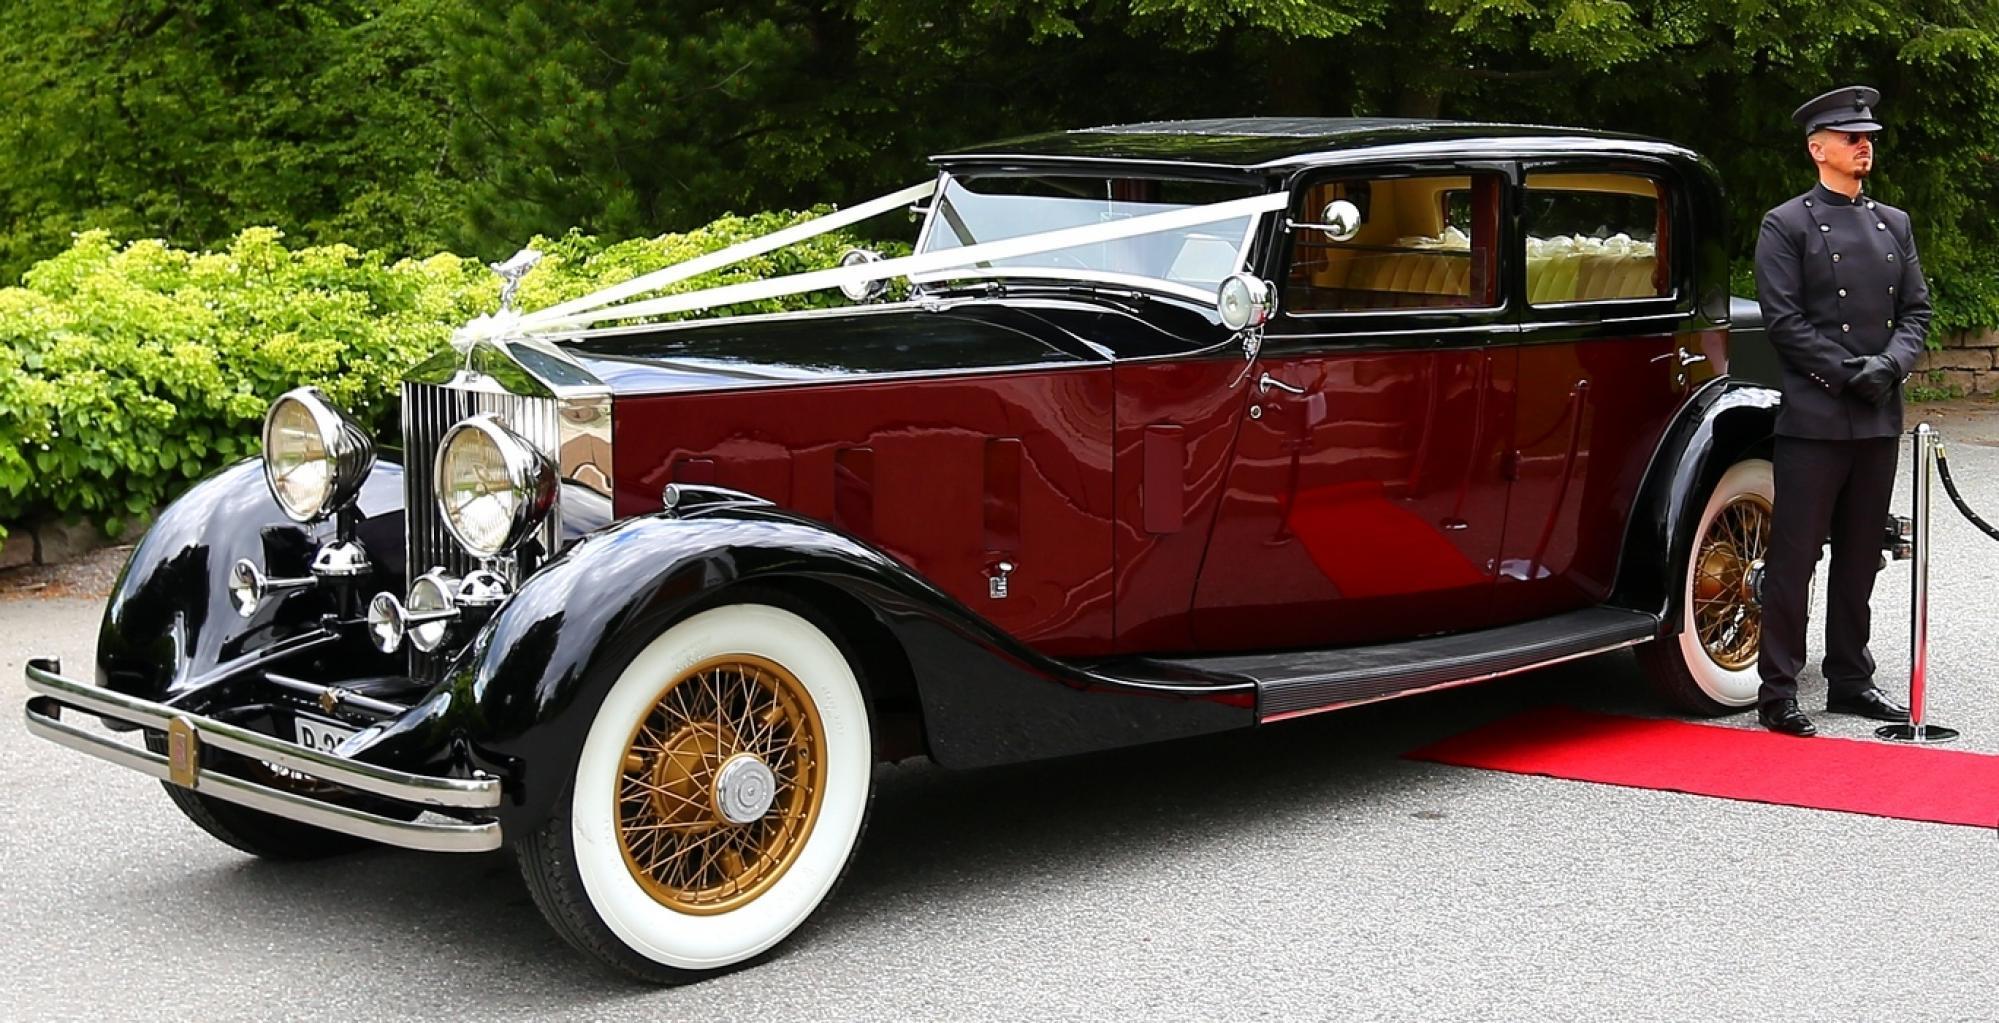 1933 Rolls Royce Phantom II sports saloon by Thrupp & Maberly ...